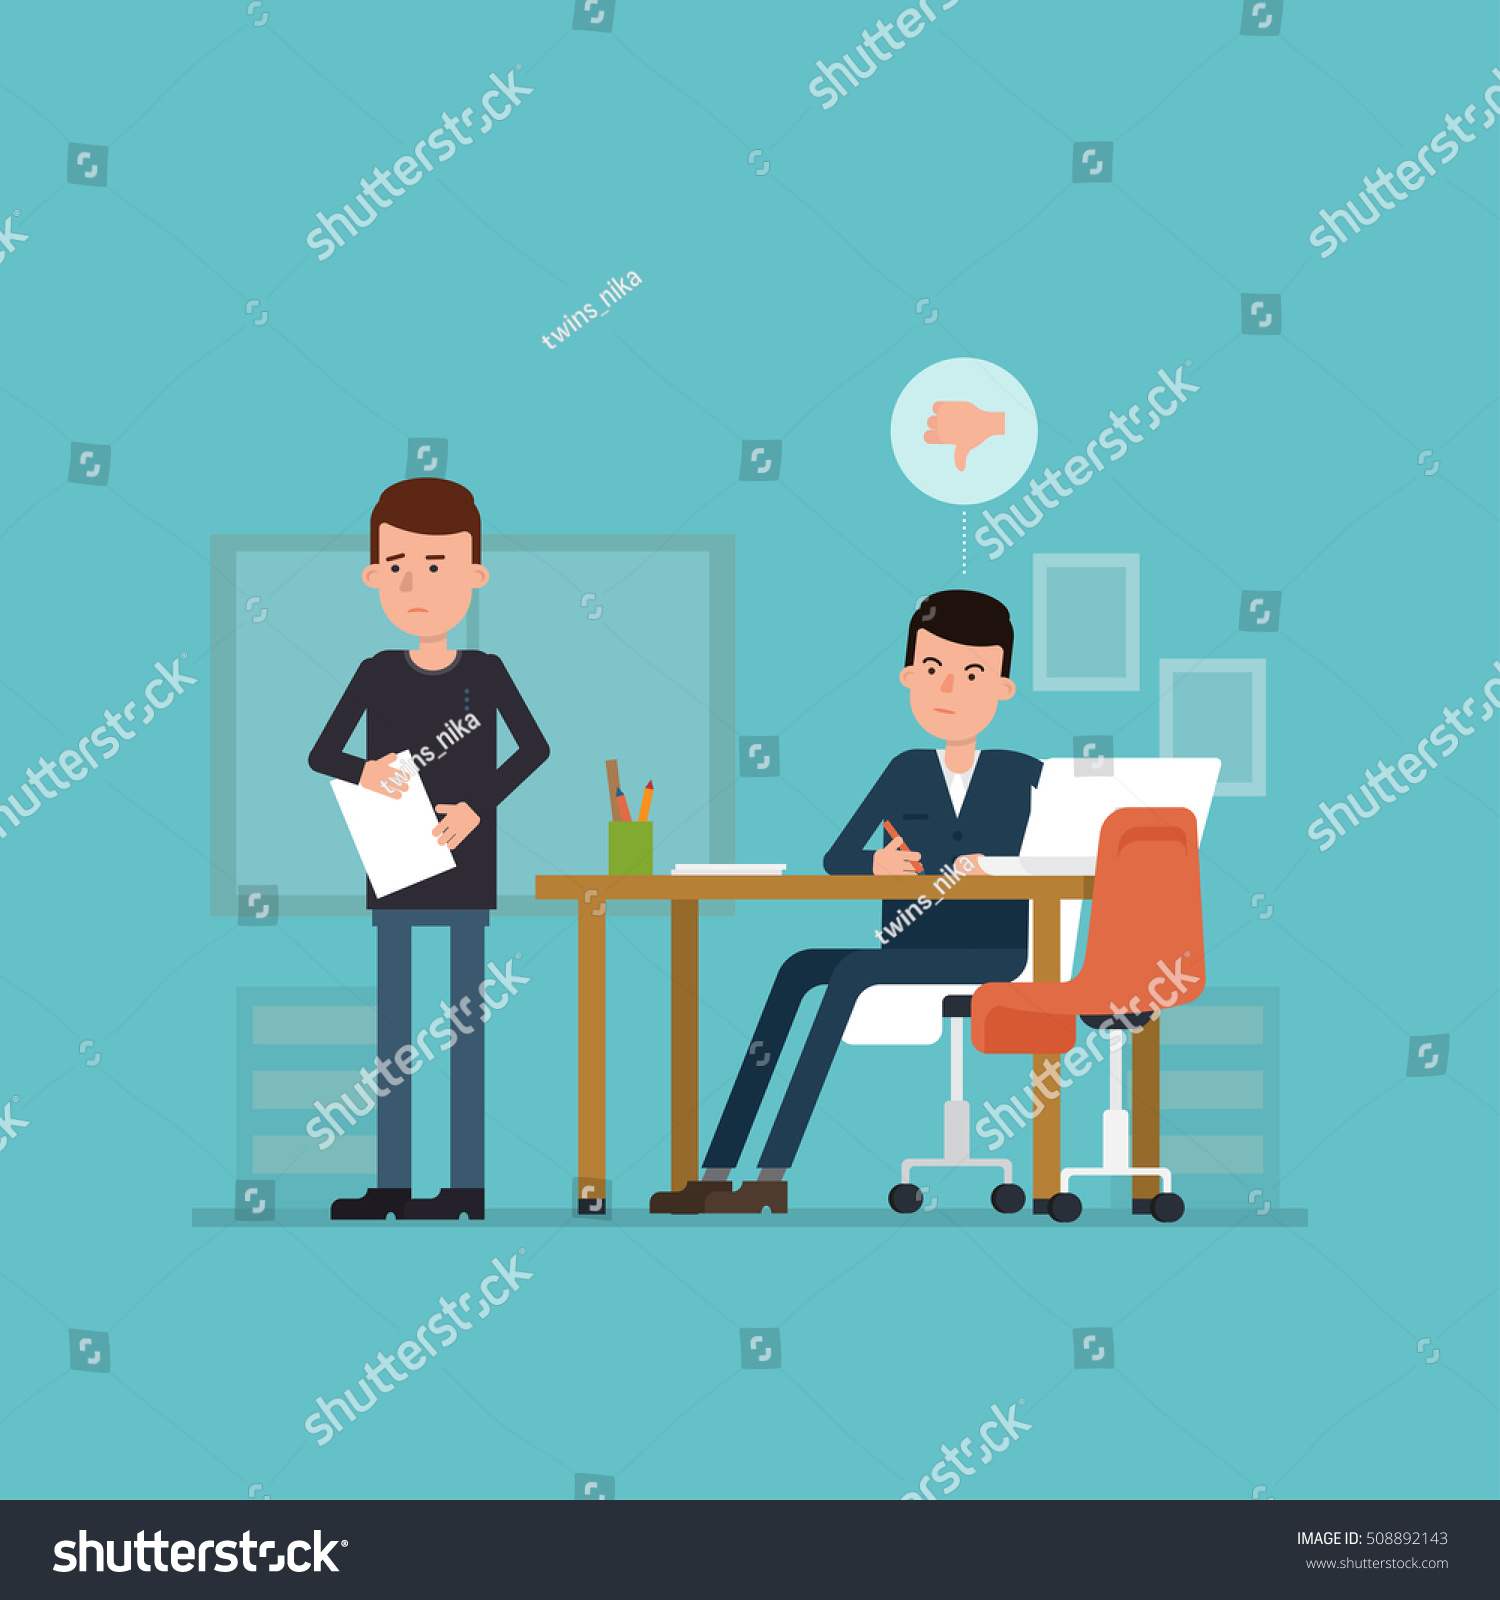 flat concept unsuccessful interview vector illustration stock flat concept of unsuccessful interview vector illustration jobseeker and employer bad impression